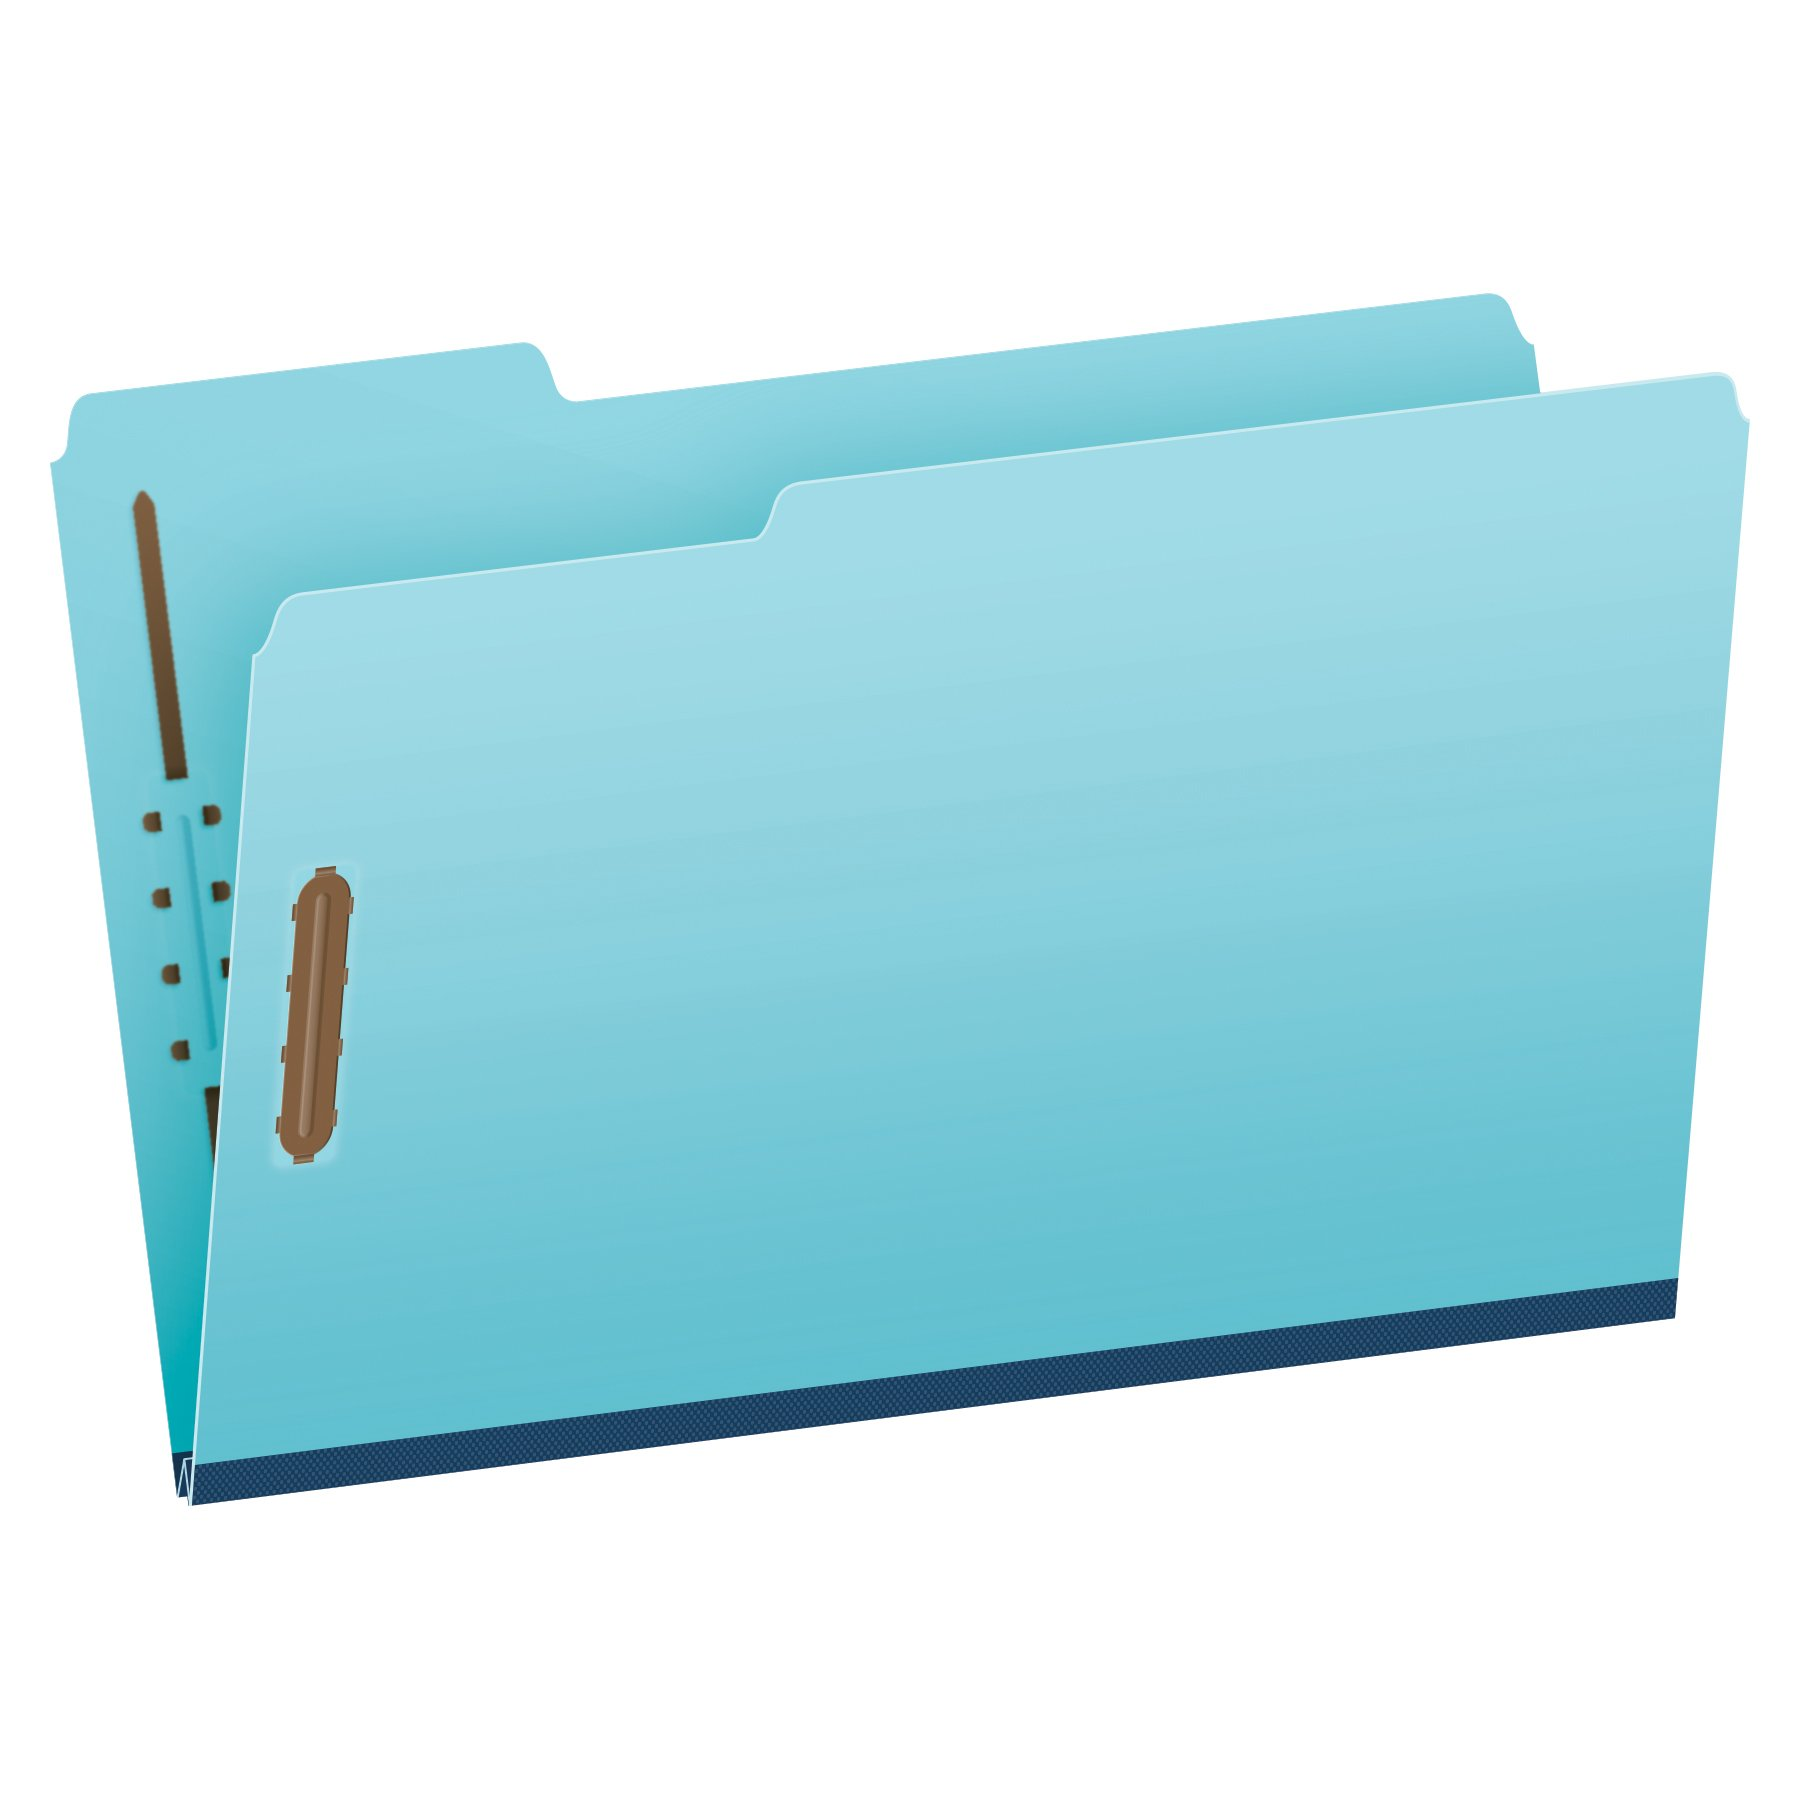 Pendaflex Pressboard Fastener Folders, Legal Size, Light Blue, 1'' Expansion, 1/3 Cut, 25/BX (616F21-3BLU)